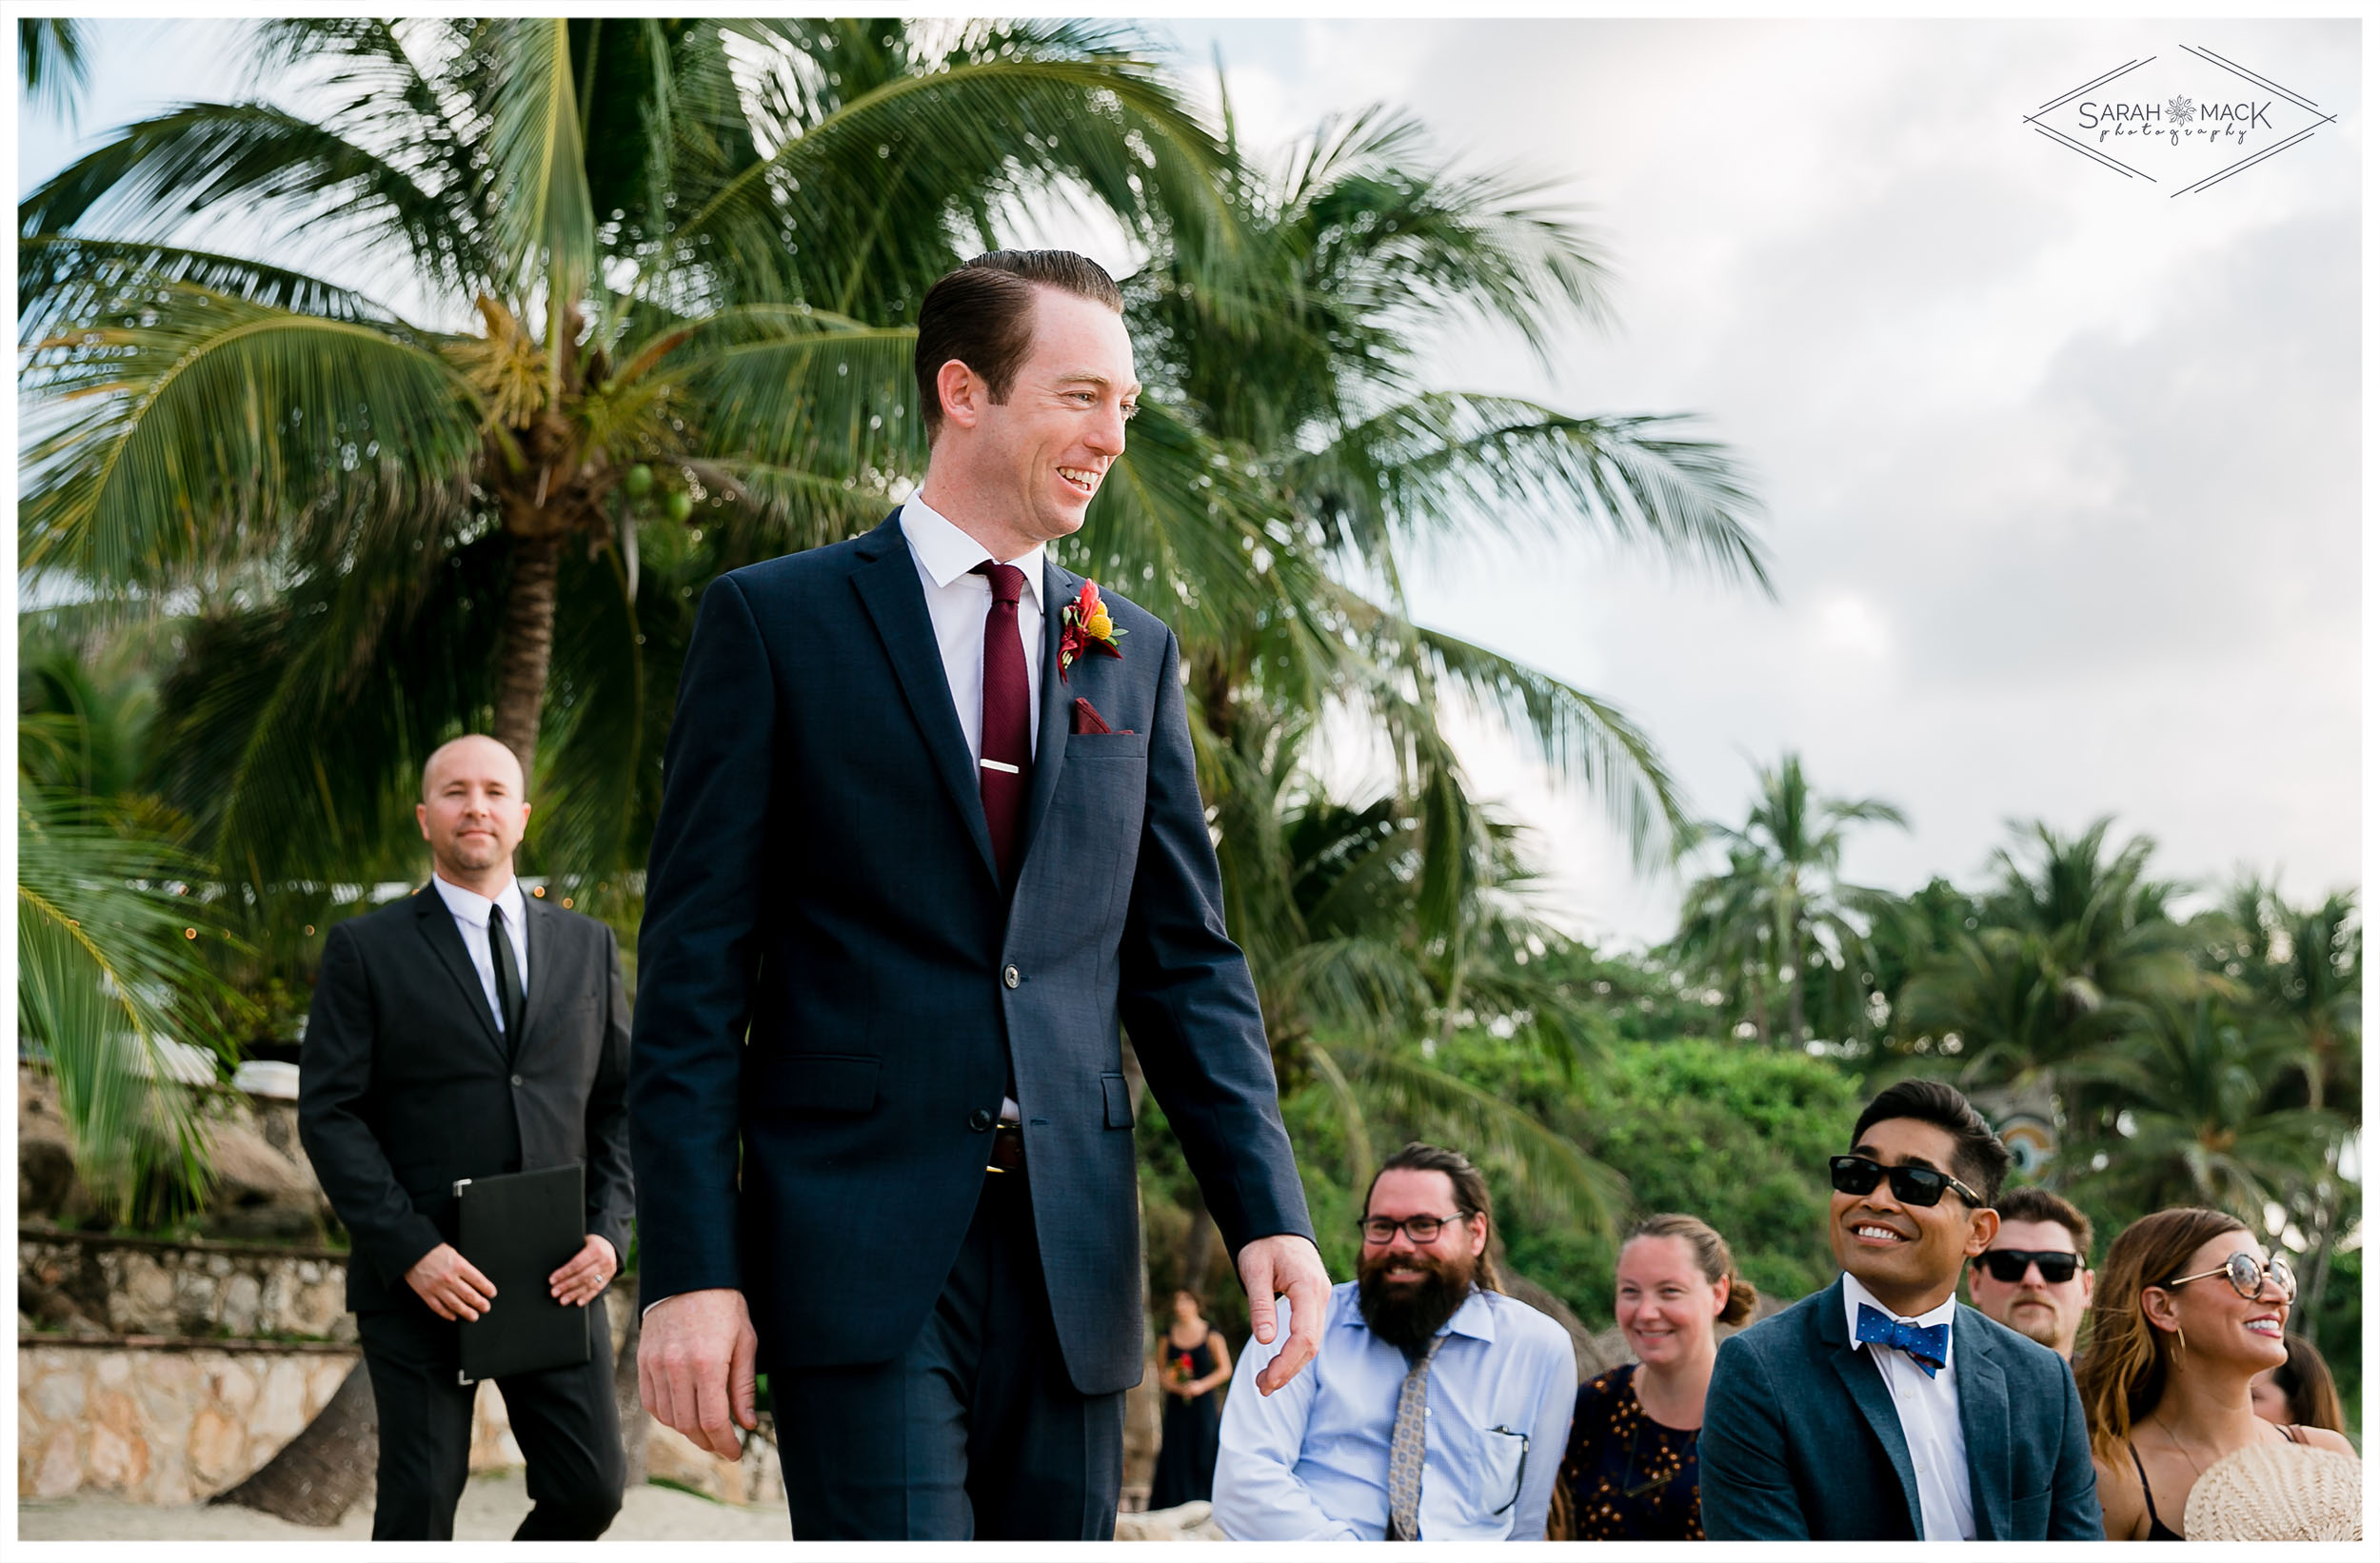 ES-Flor-de-Playa-Sayulita-Wedding-Photography-34.jpg